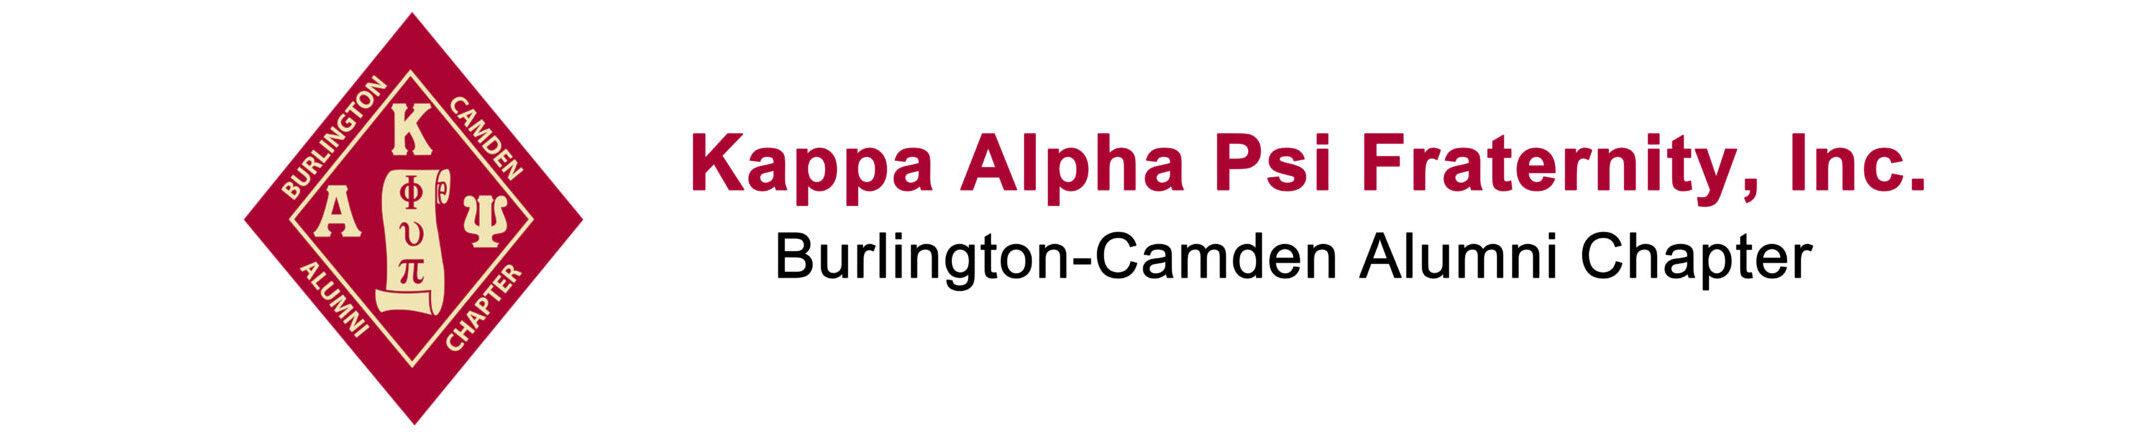 Kappa Alpha Psi Fraternity, Inc.